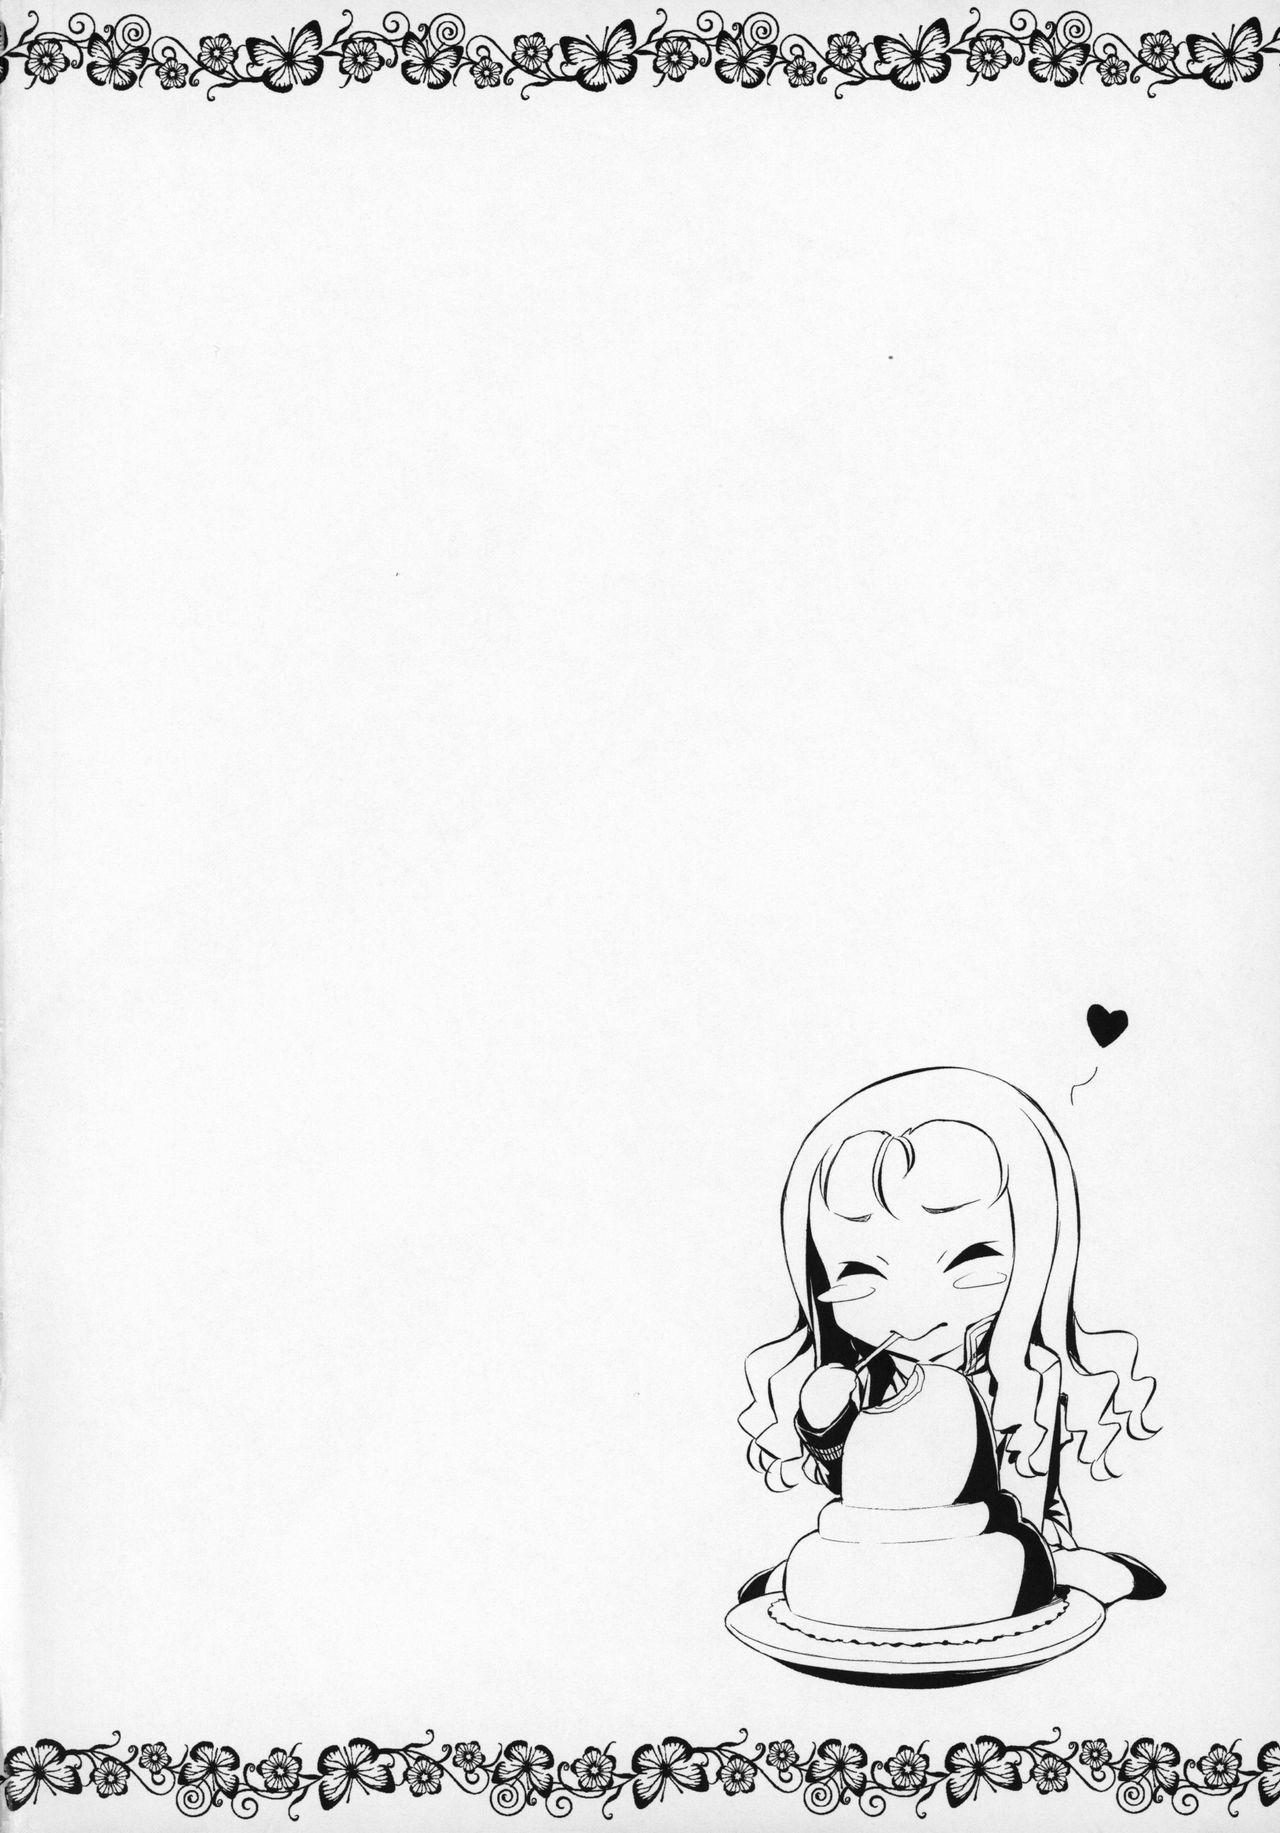 Marie-sama no Sankakujime 2